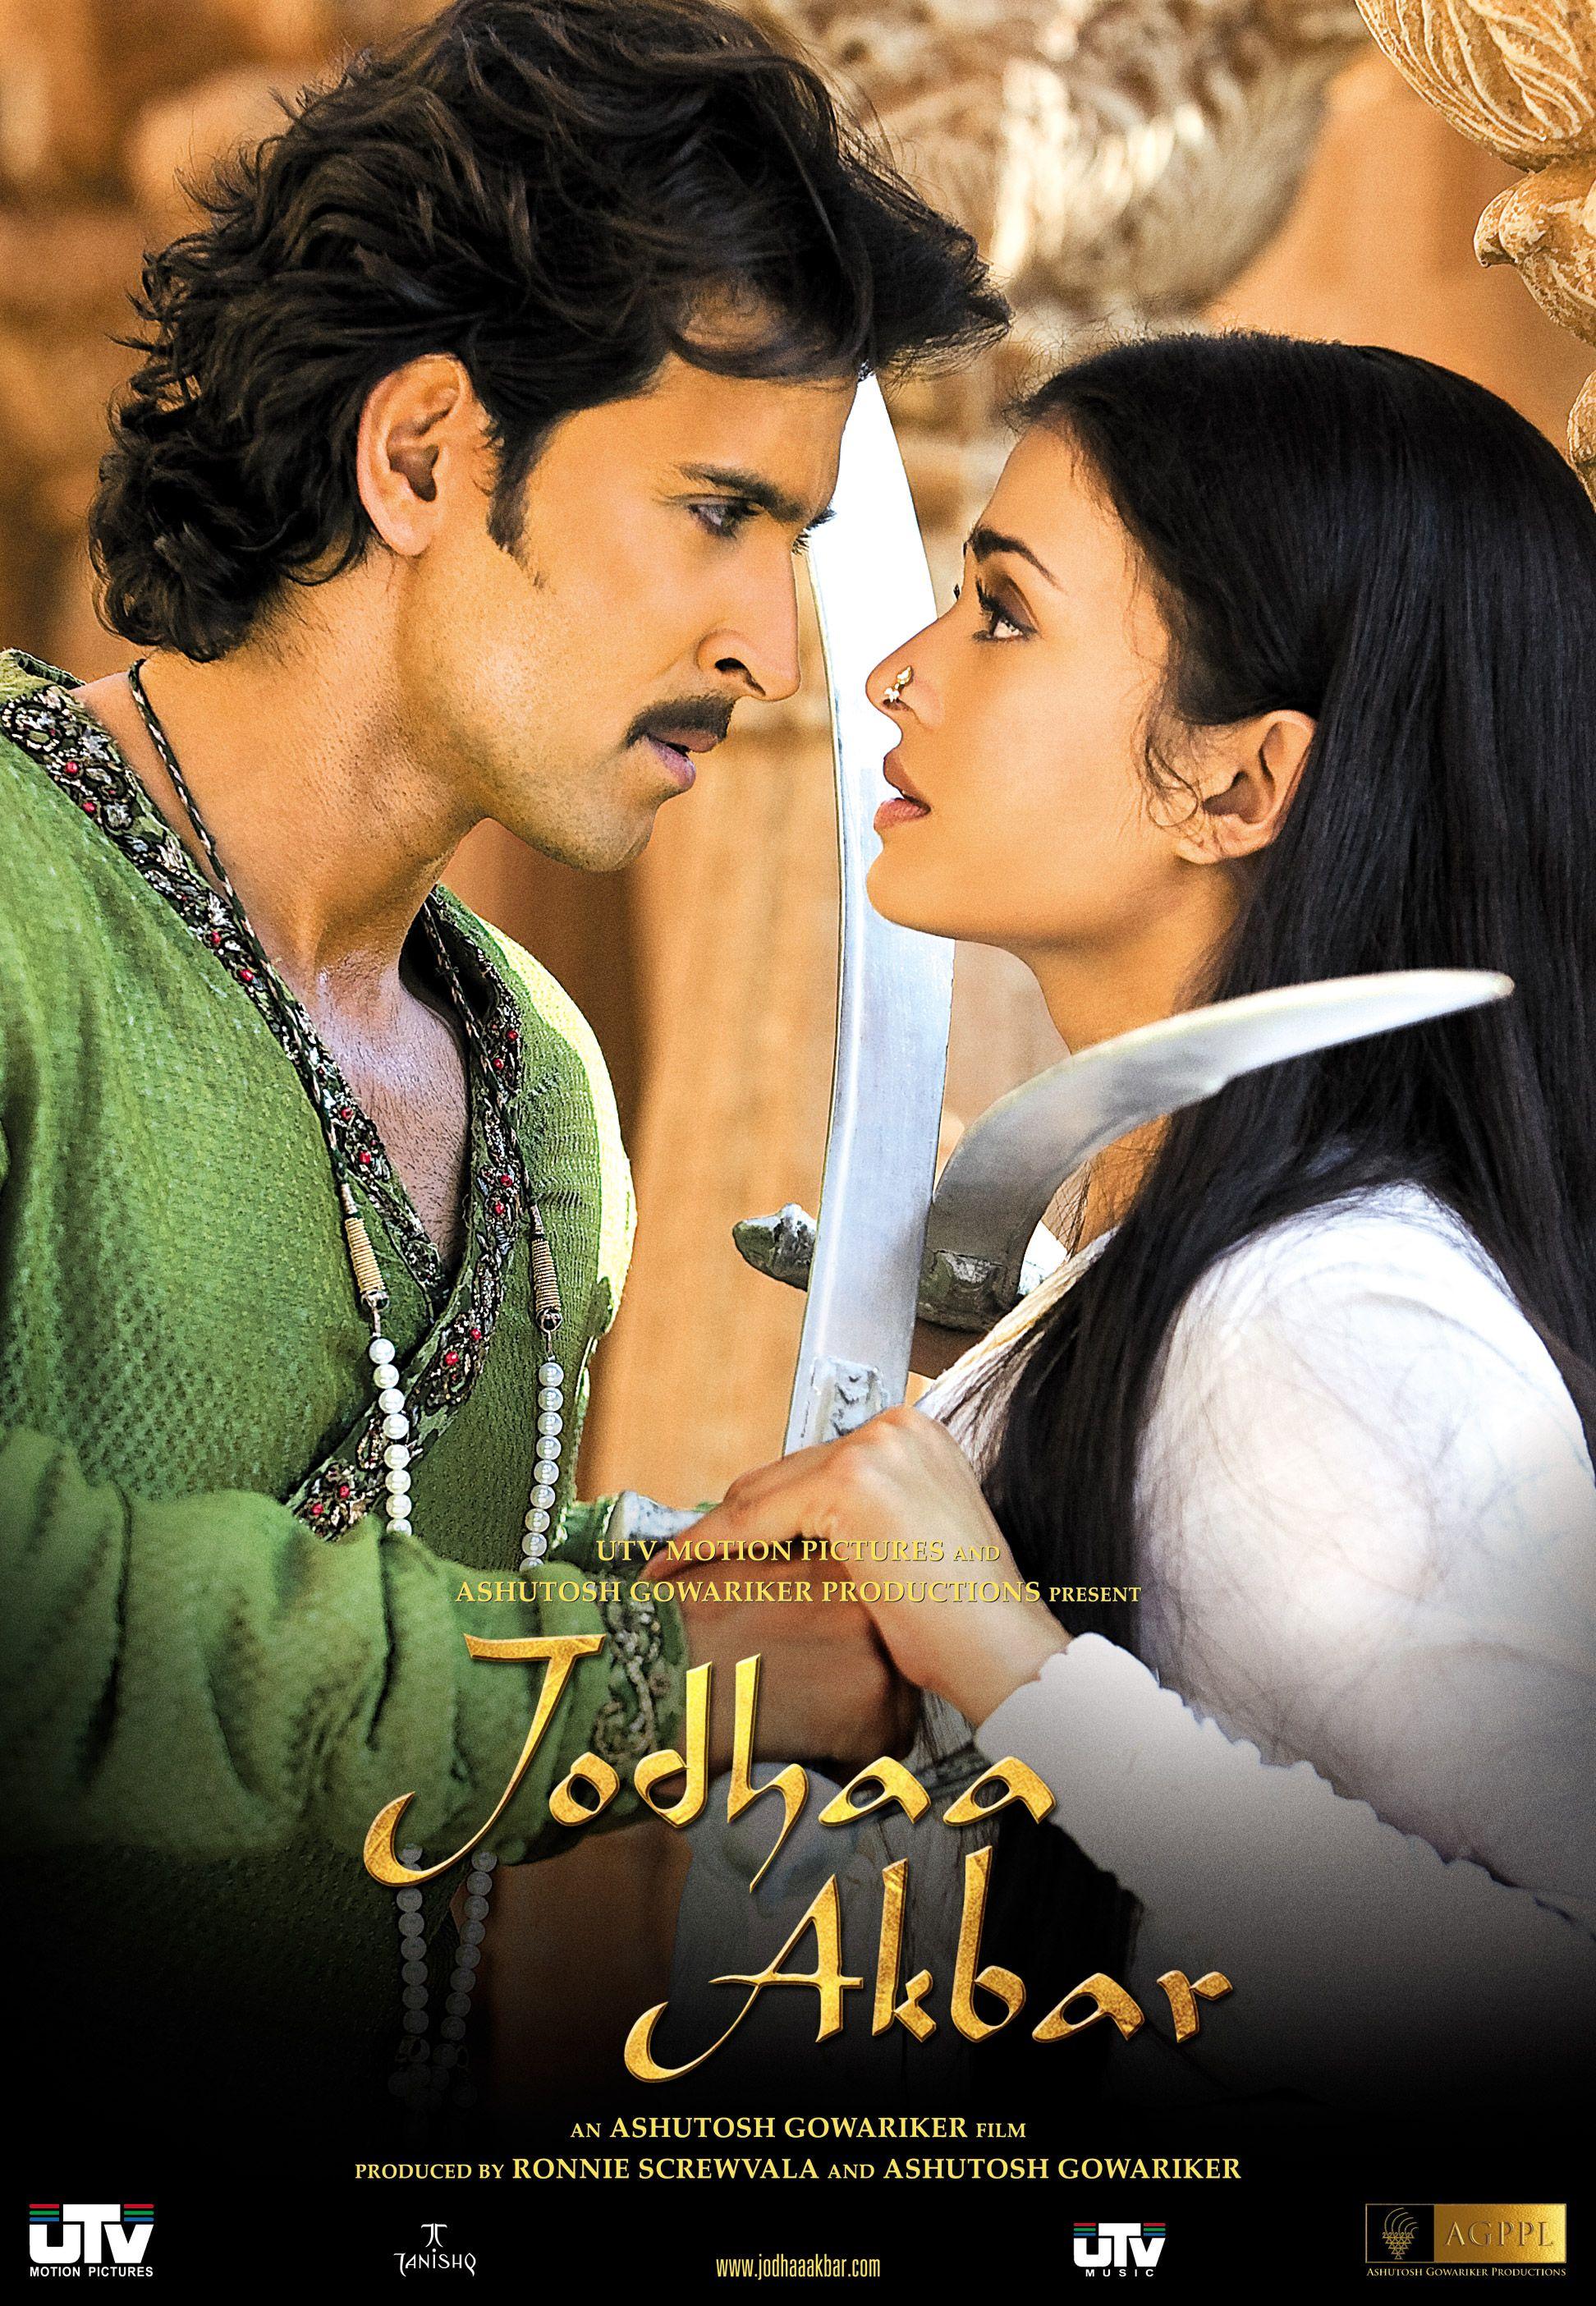 Jodhaa Akbar 2008 Best Bollywood Movies Bollywood Movies Bollywood Posters